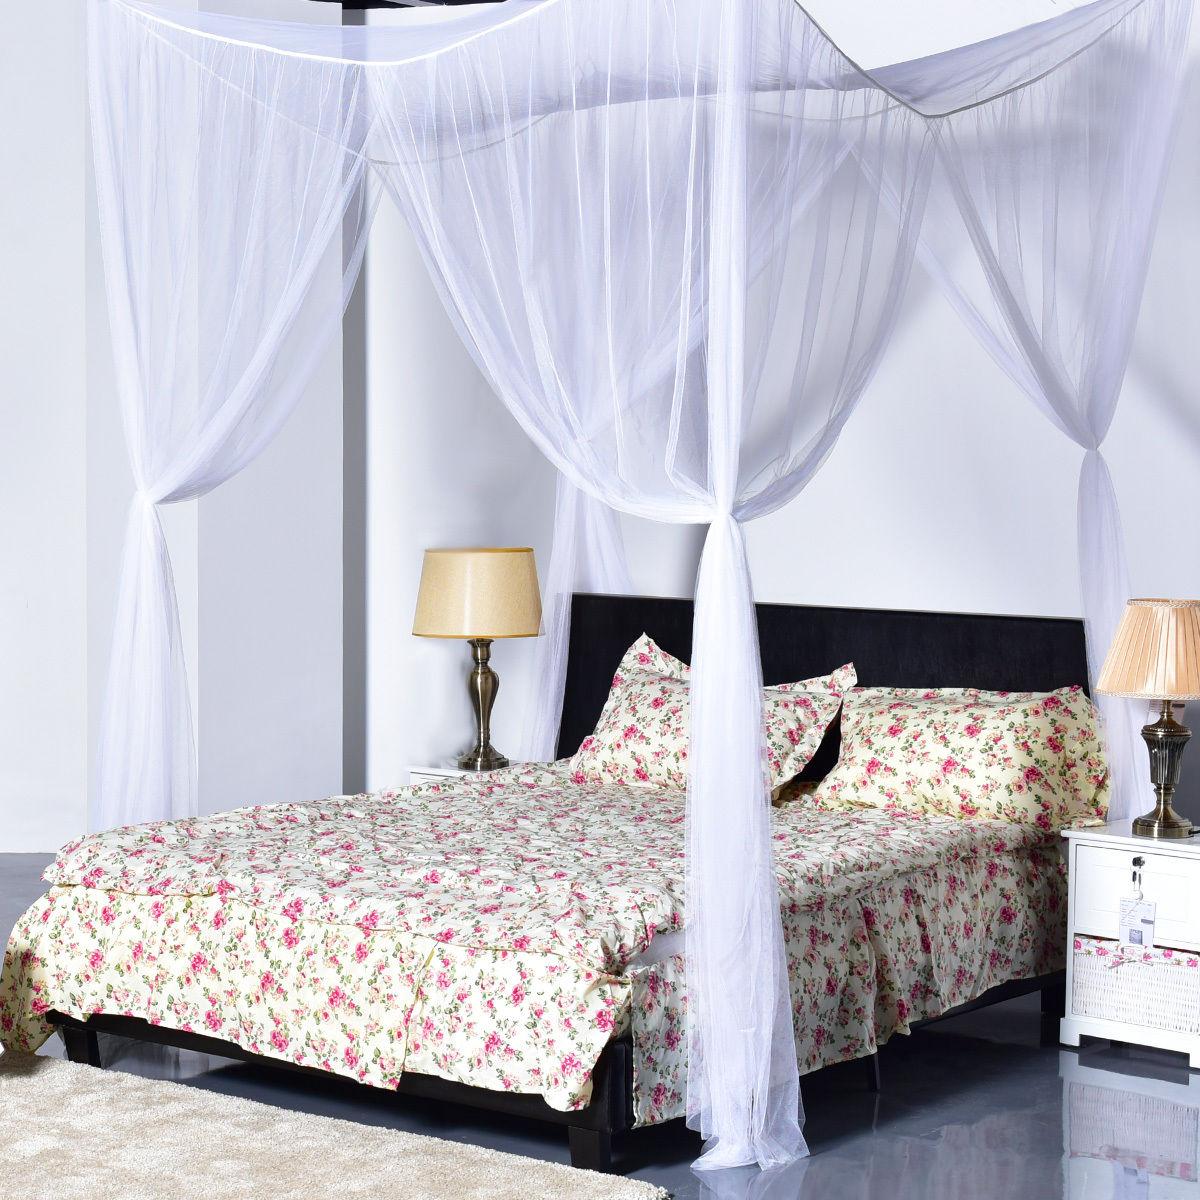 Top 4 Corner Polyester Fabric Square Mosquito